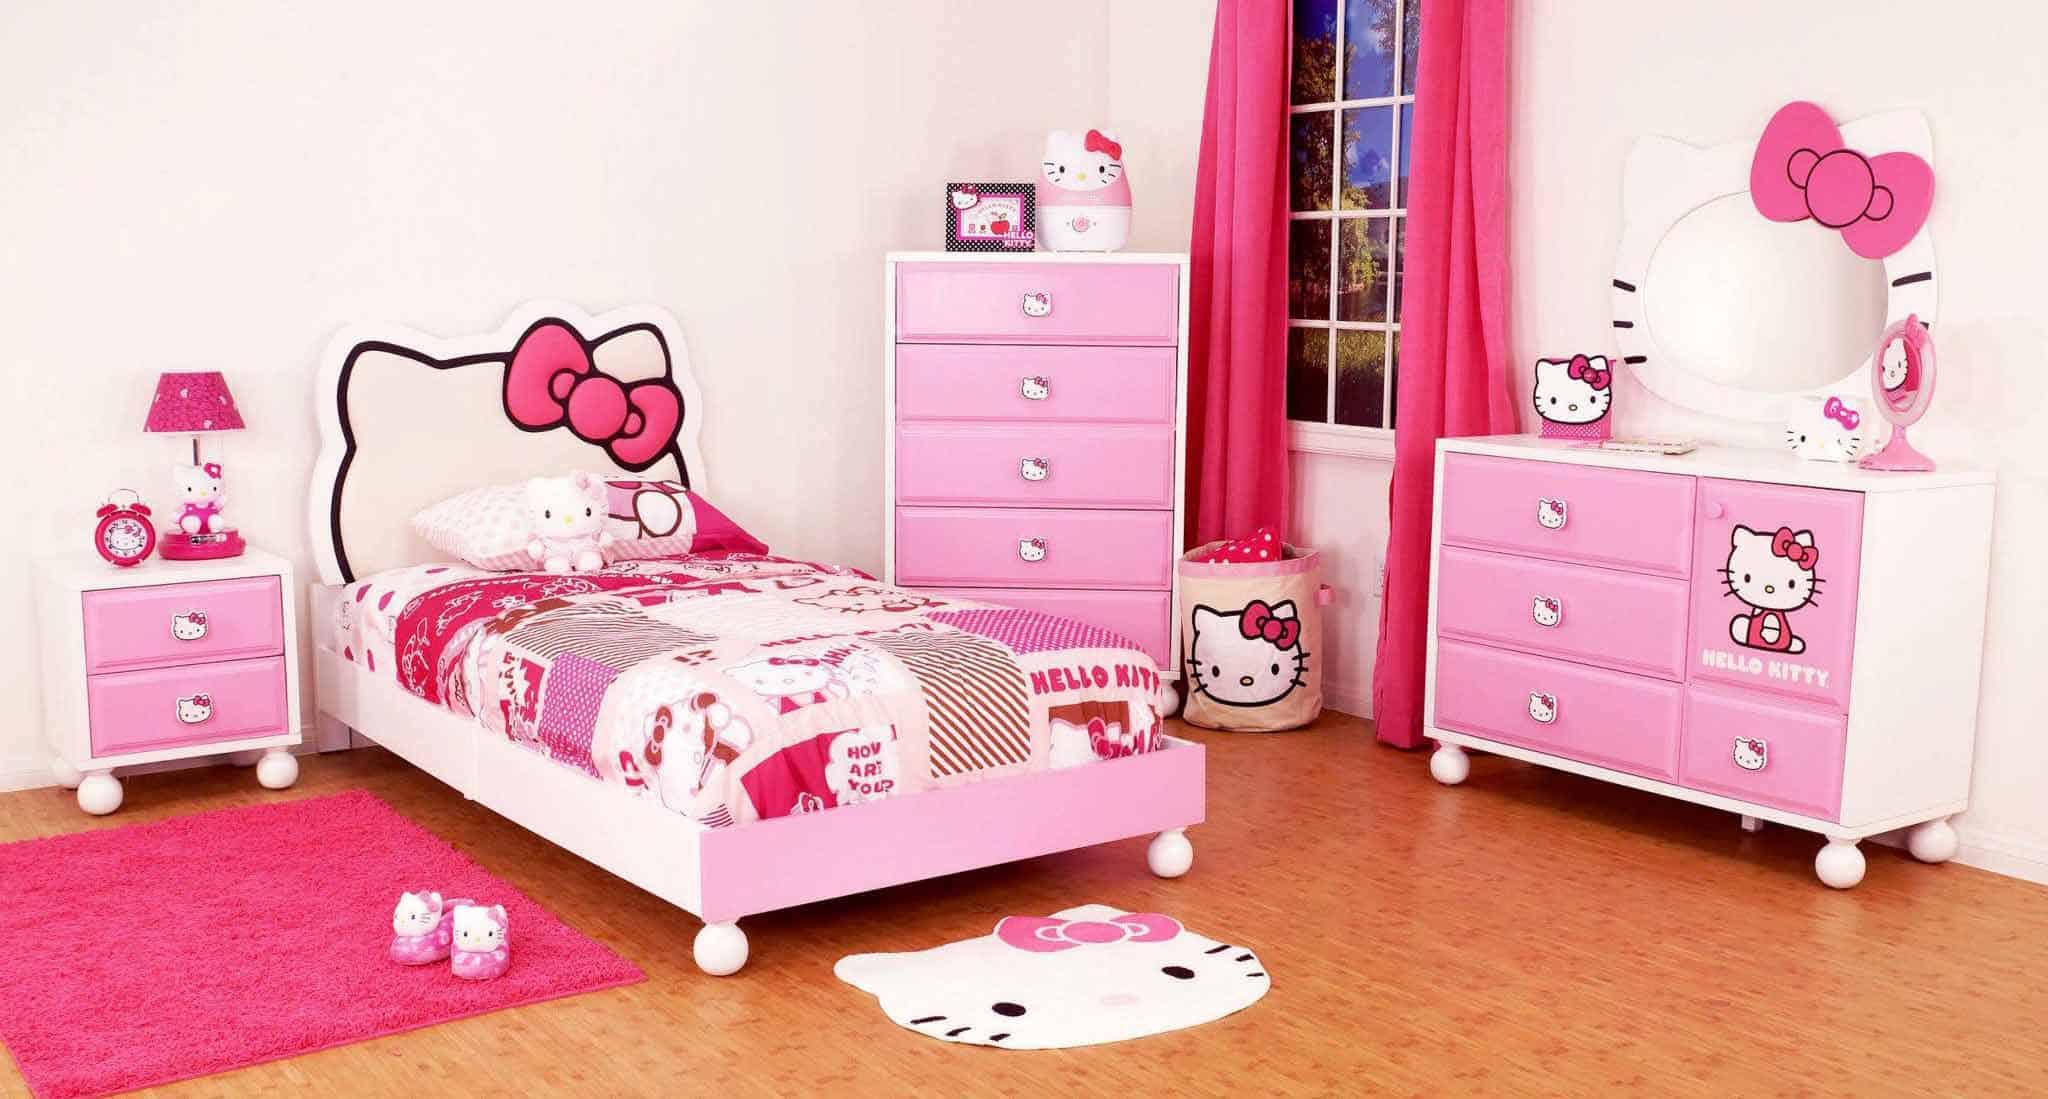 Desain Kamar Tidur Anak Motif Hello Kitty Pasarsemarang Com